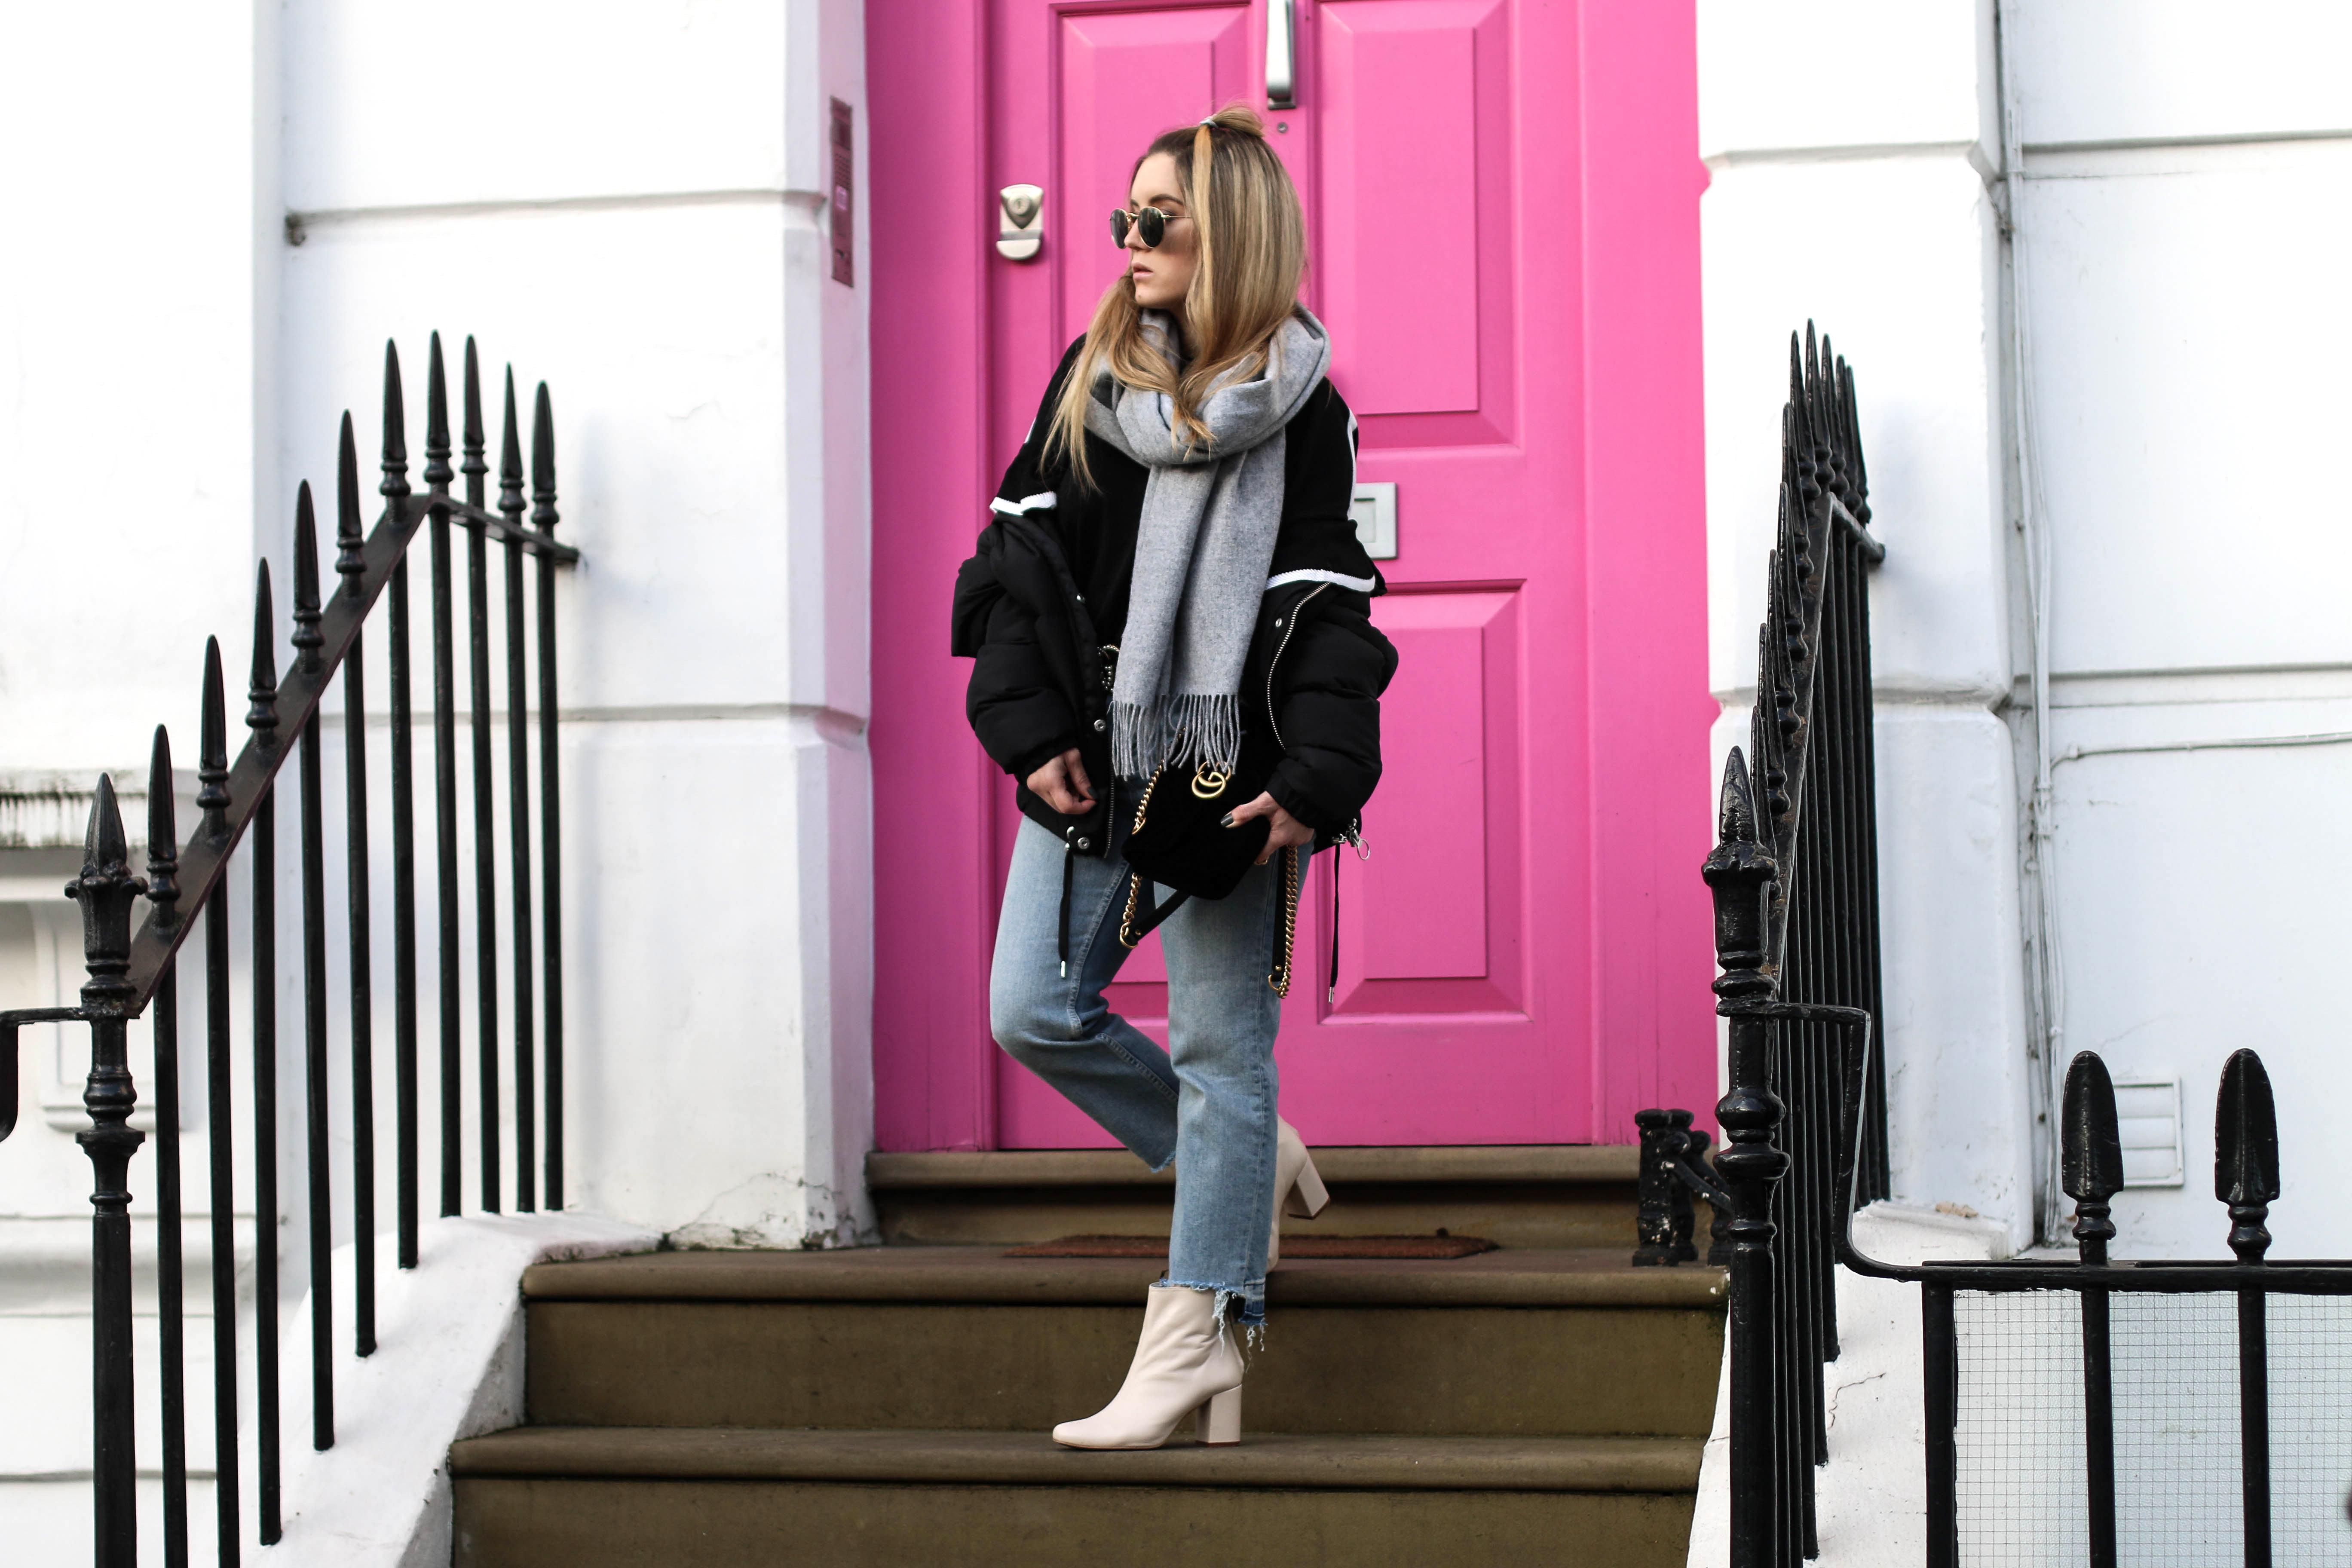 Gucci Marmont Bag London Streetstyle Fashiontwinstinct